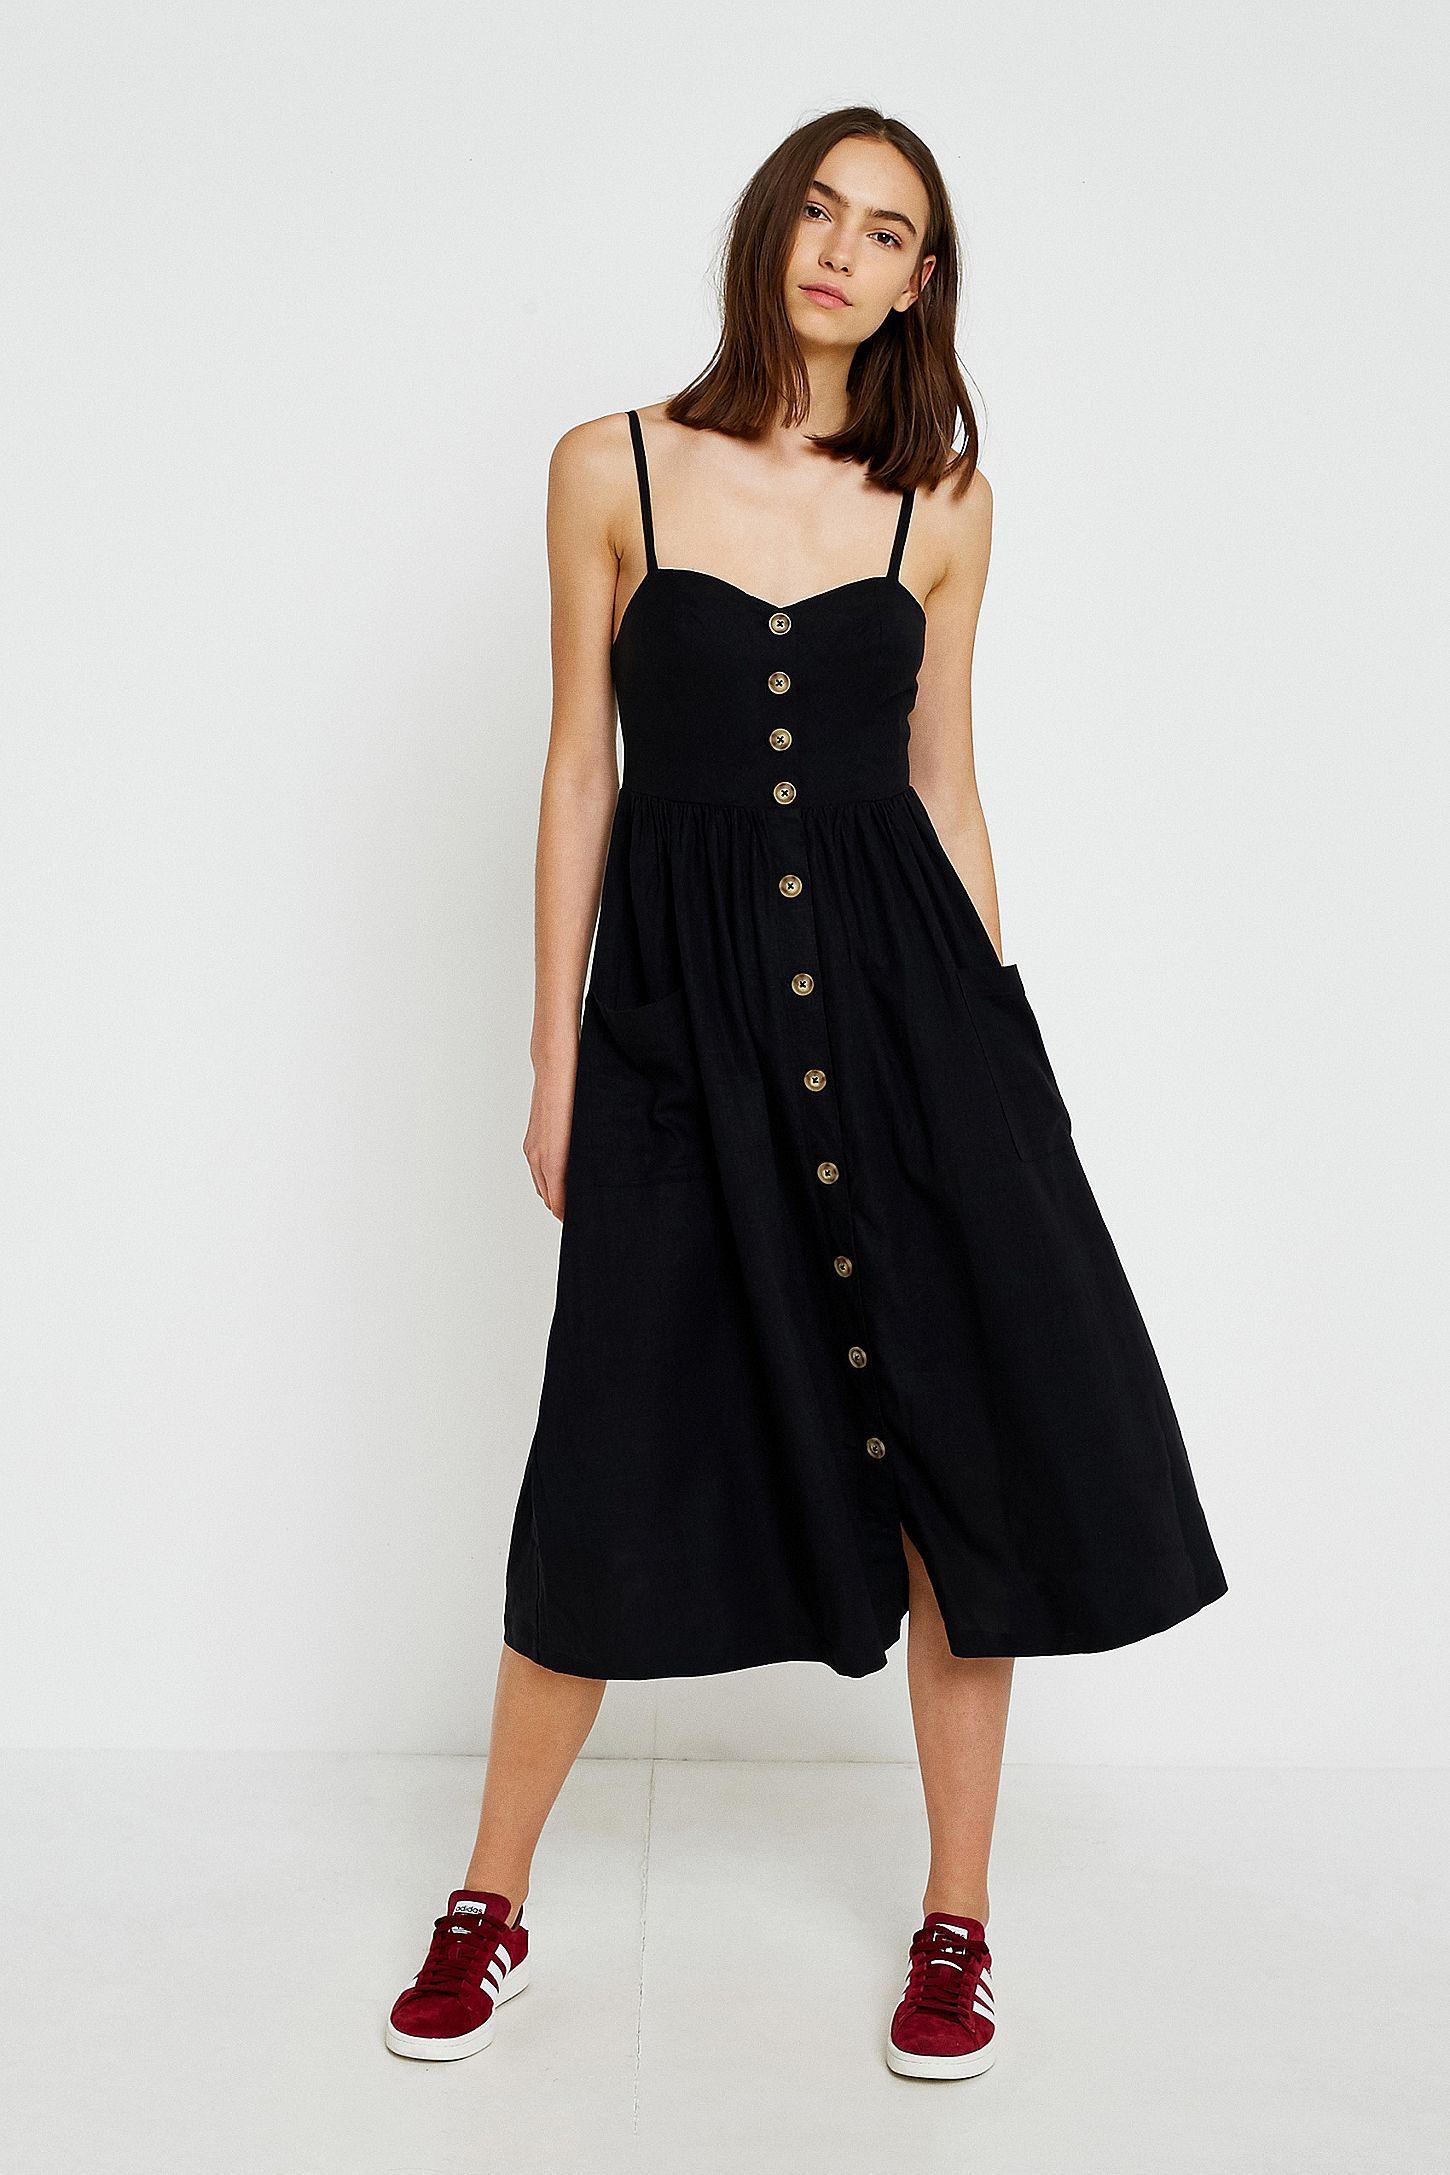 cfbc0633027 Slide View  1  UO Emilia Black Button-Through Midi Dress